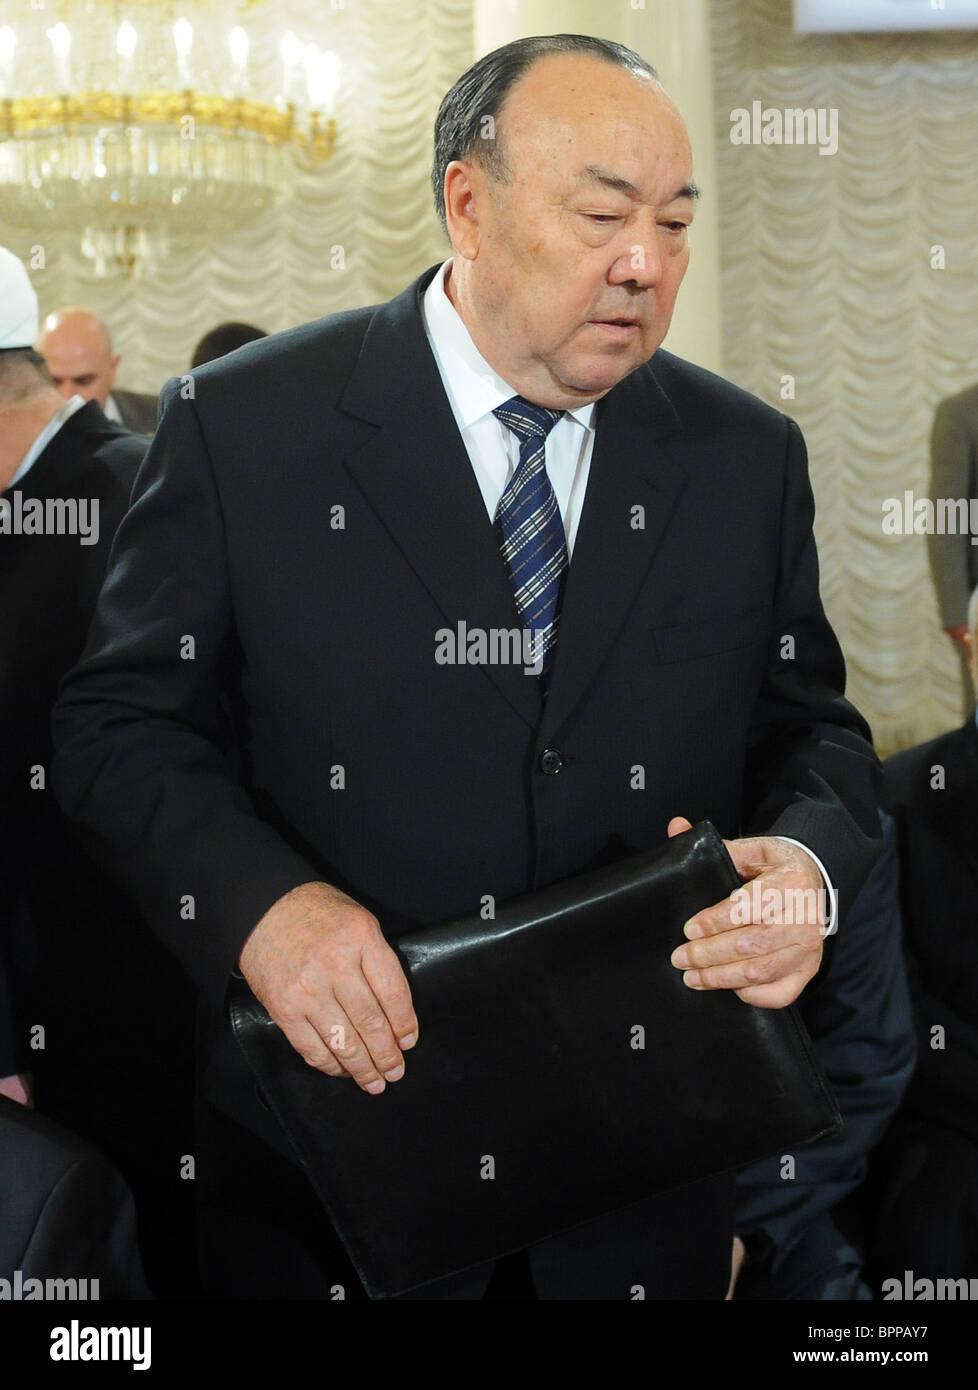 Ingushetia leader receives Al-Fakhr Muslim Award - Stock Image